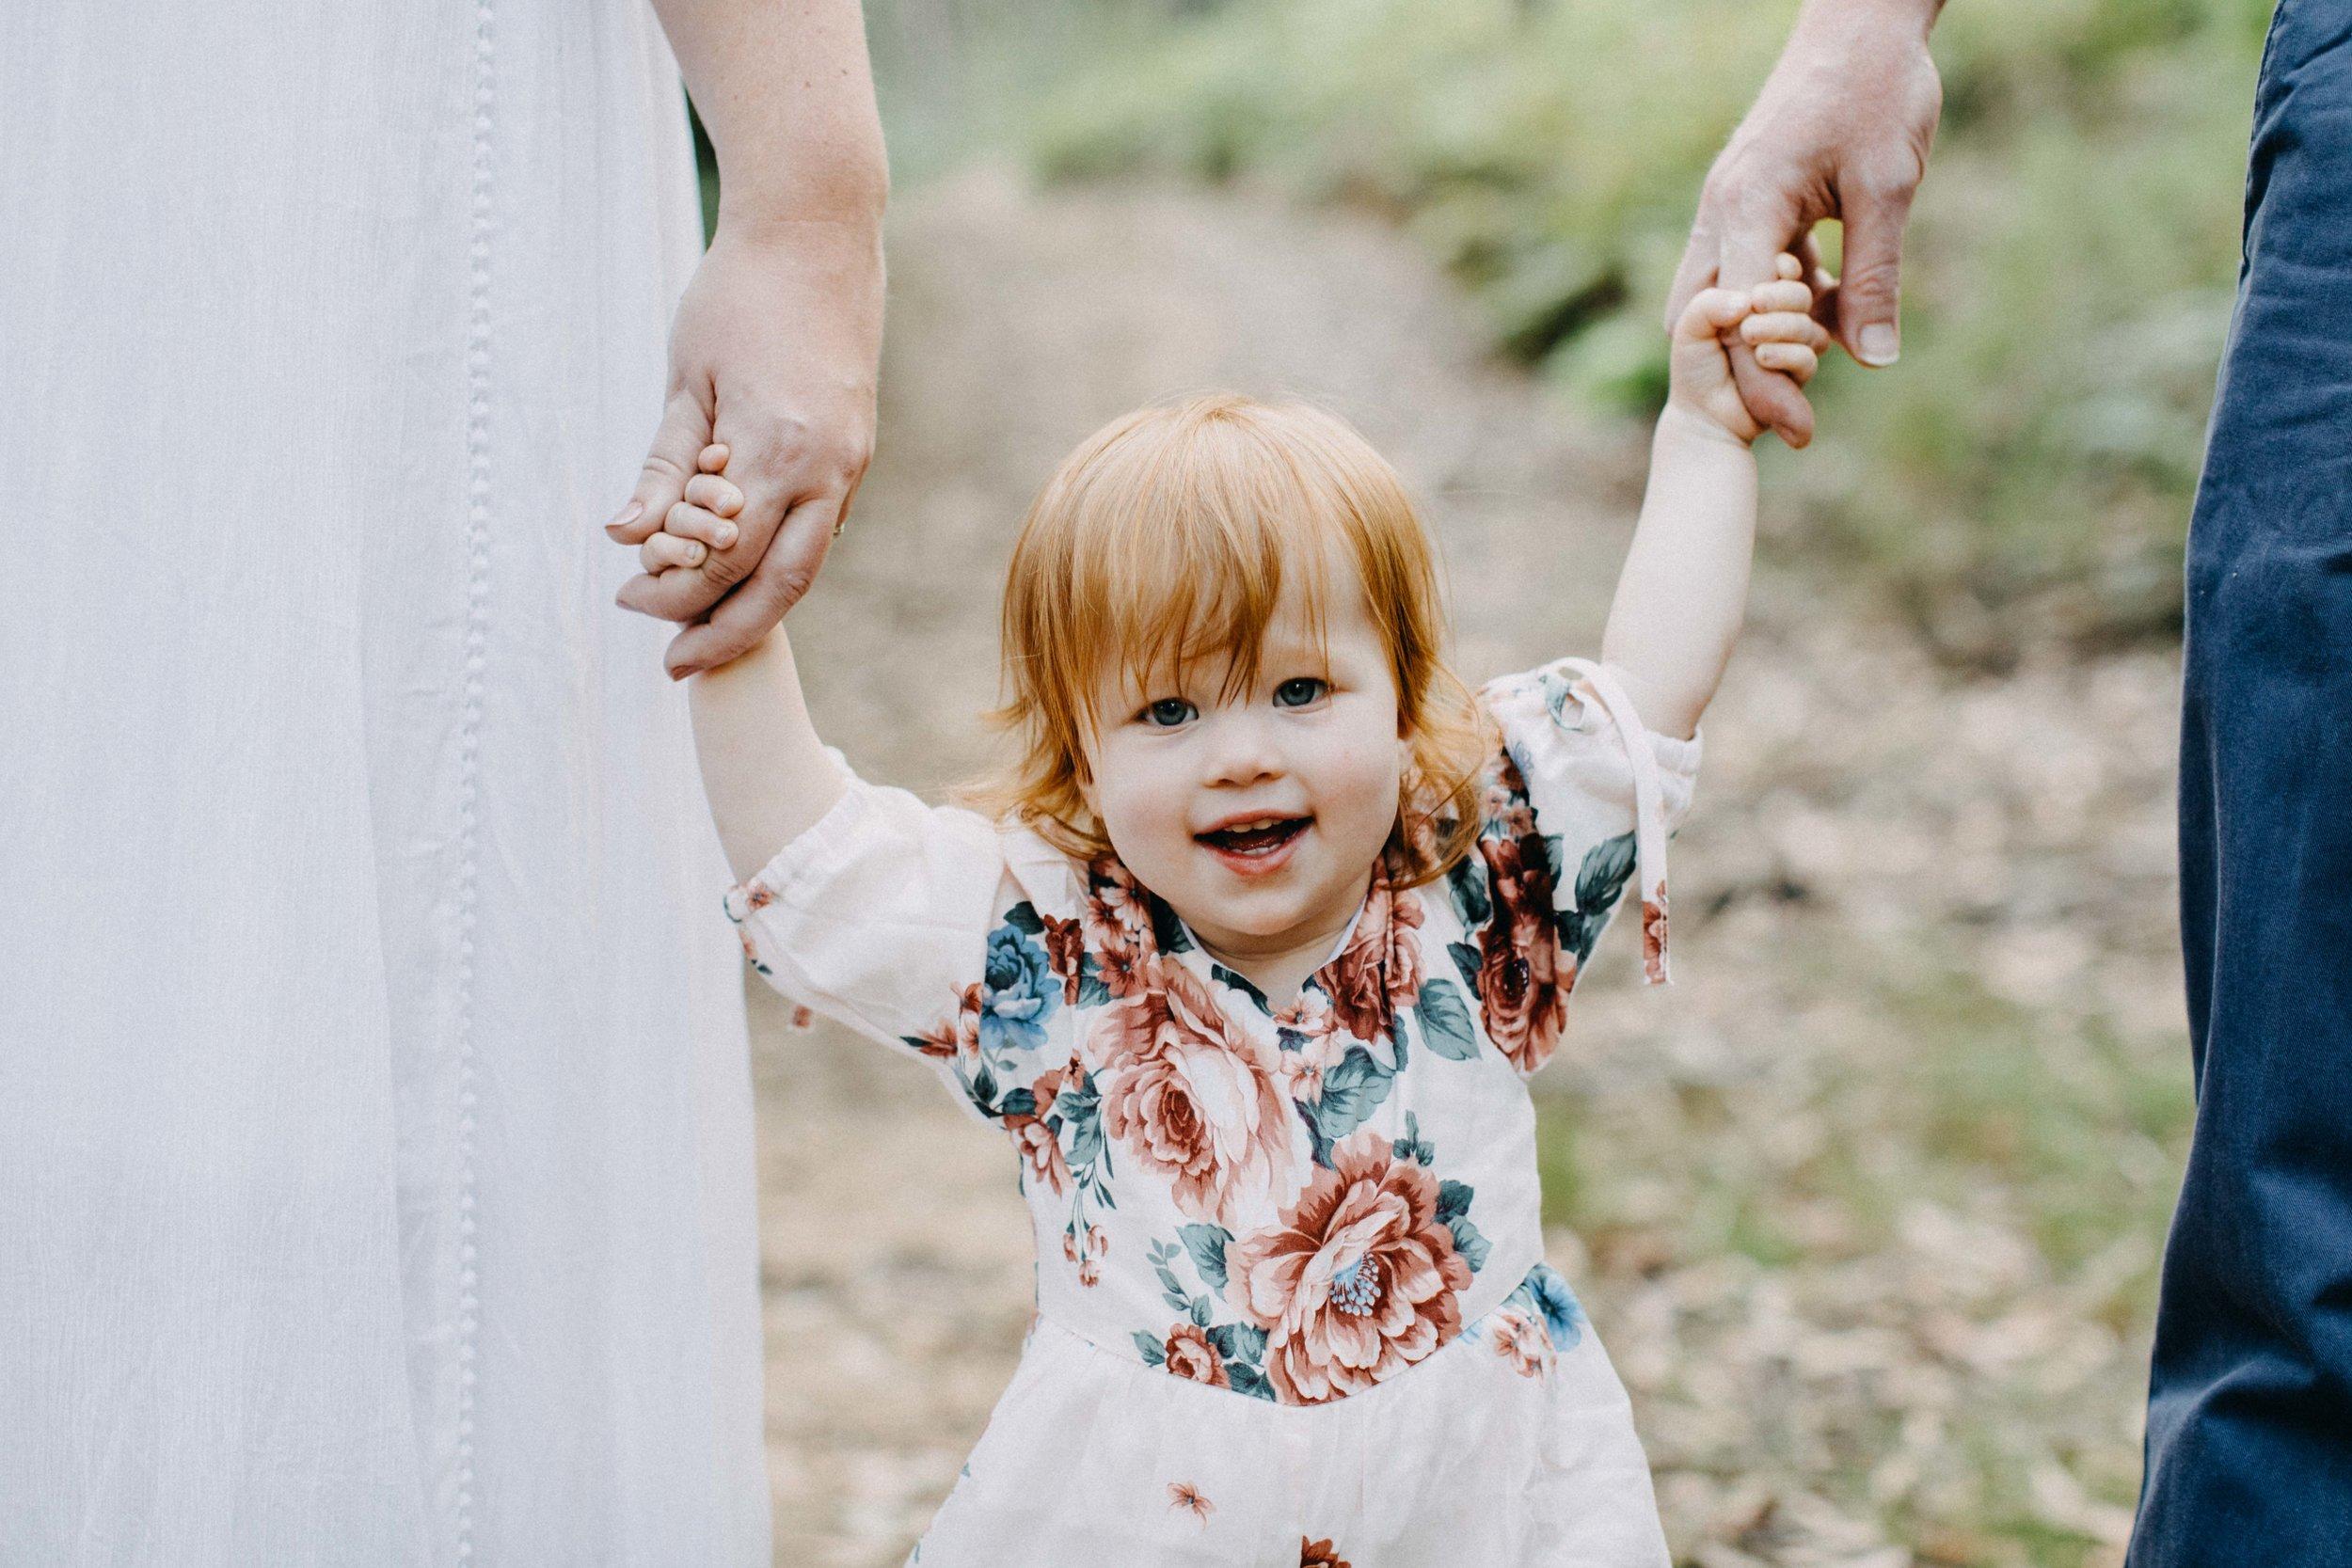 southern-highlands-maternity-photography-macarthur-ruth-www.emilyobrienphotography.net-7.jpg